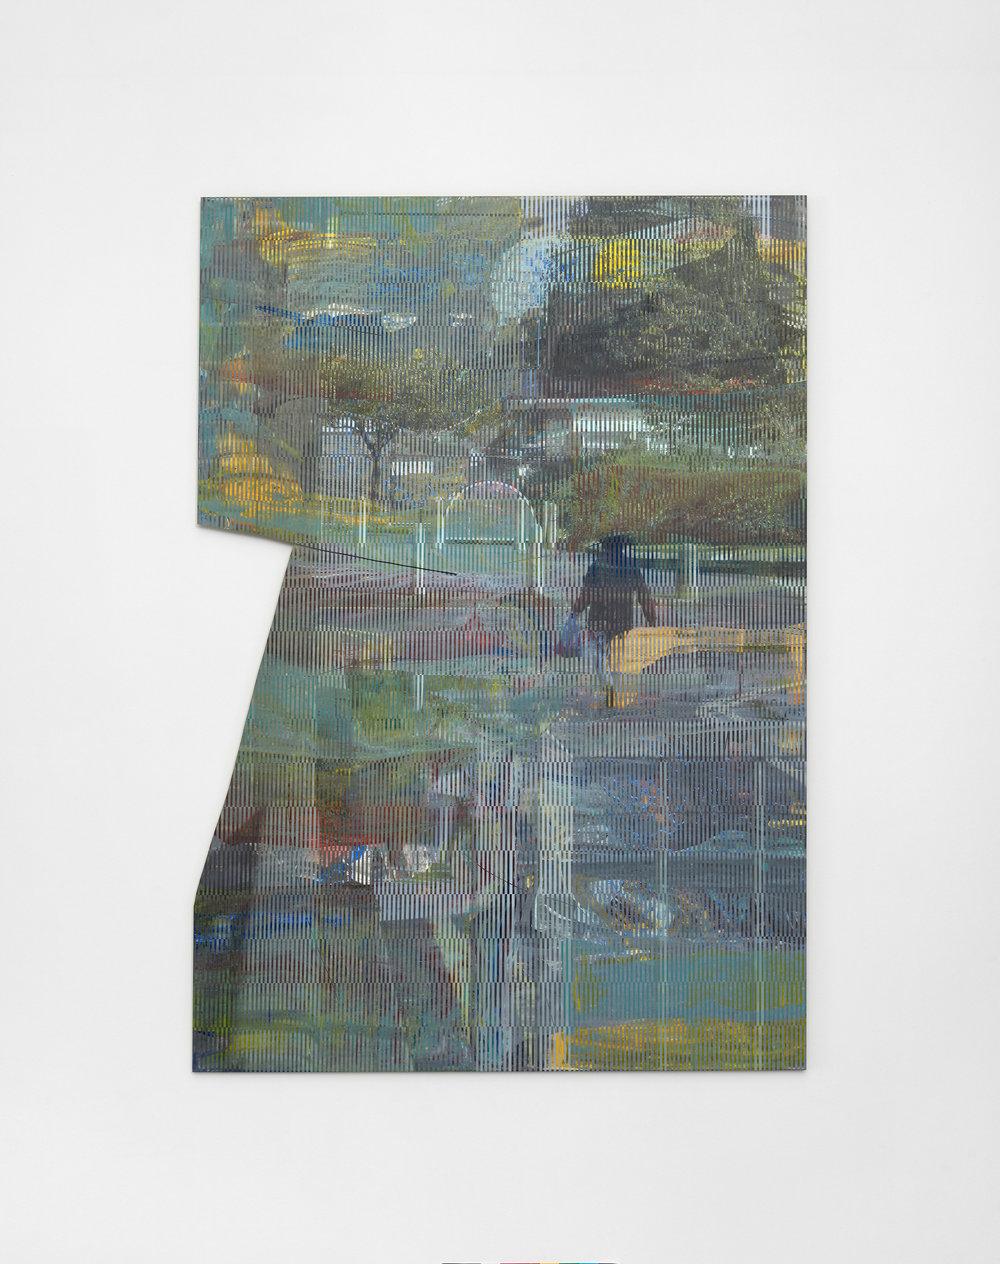 Daniel Lipp  Dog days, 2017  Acrylic and UV cured ink on aluminium  100 x 70 cm